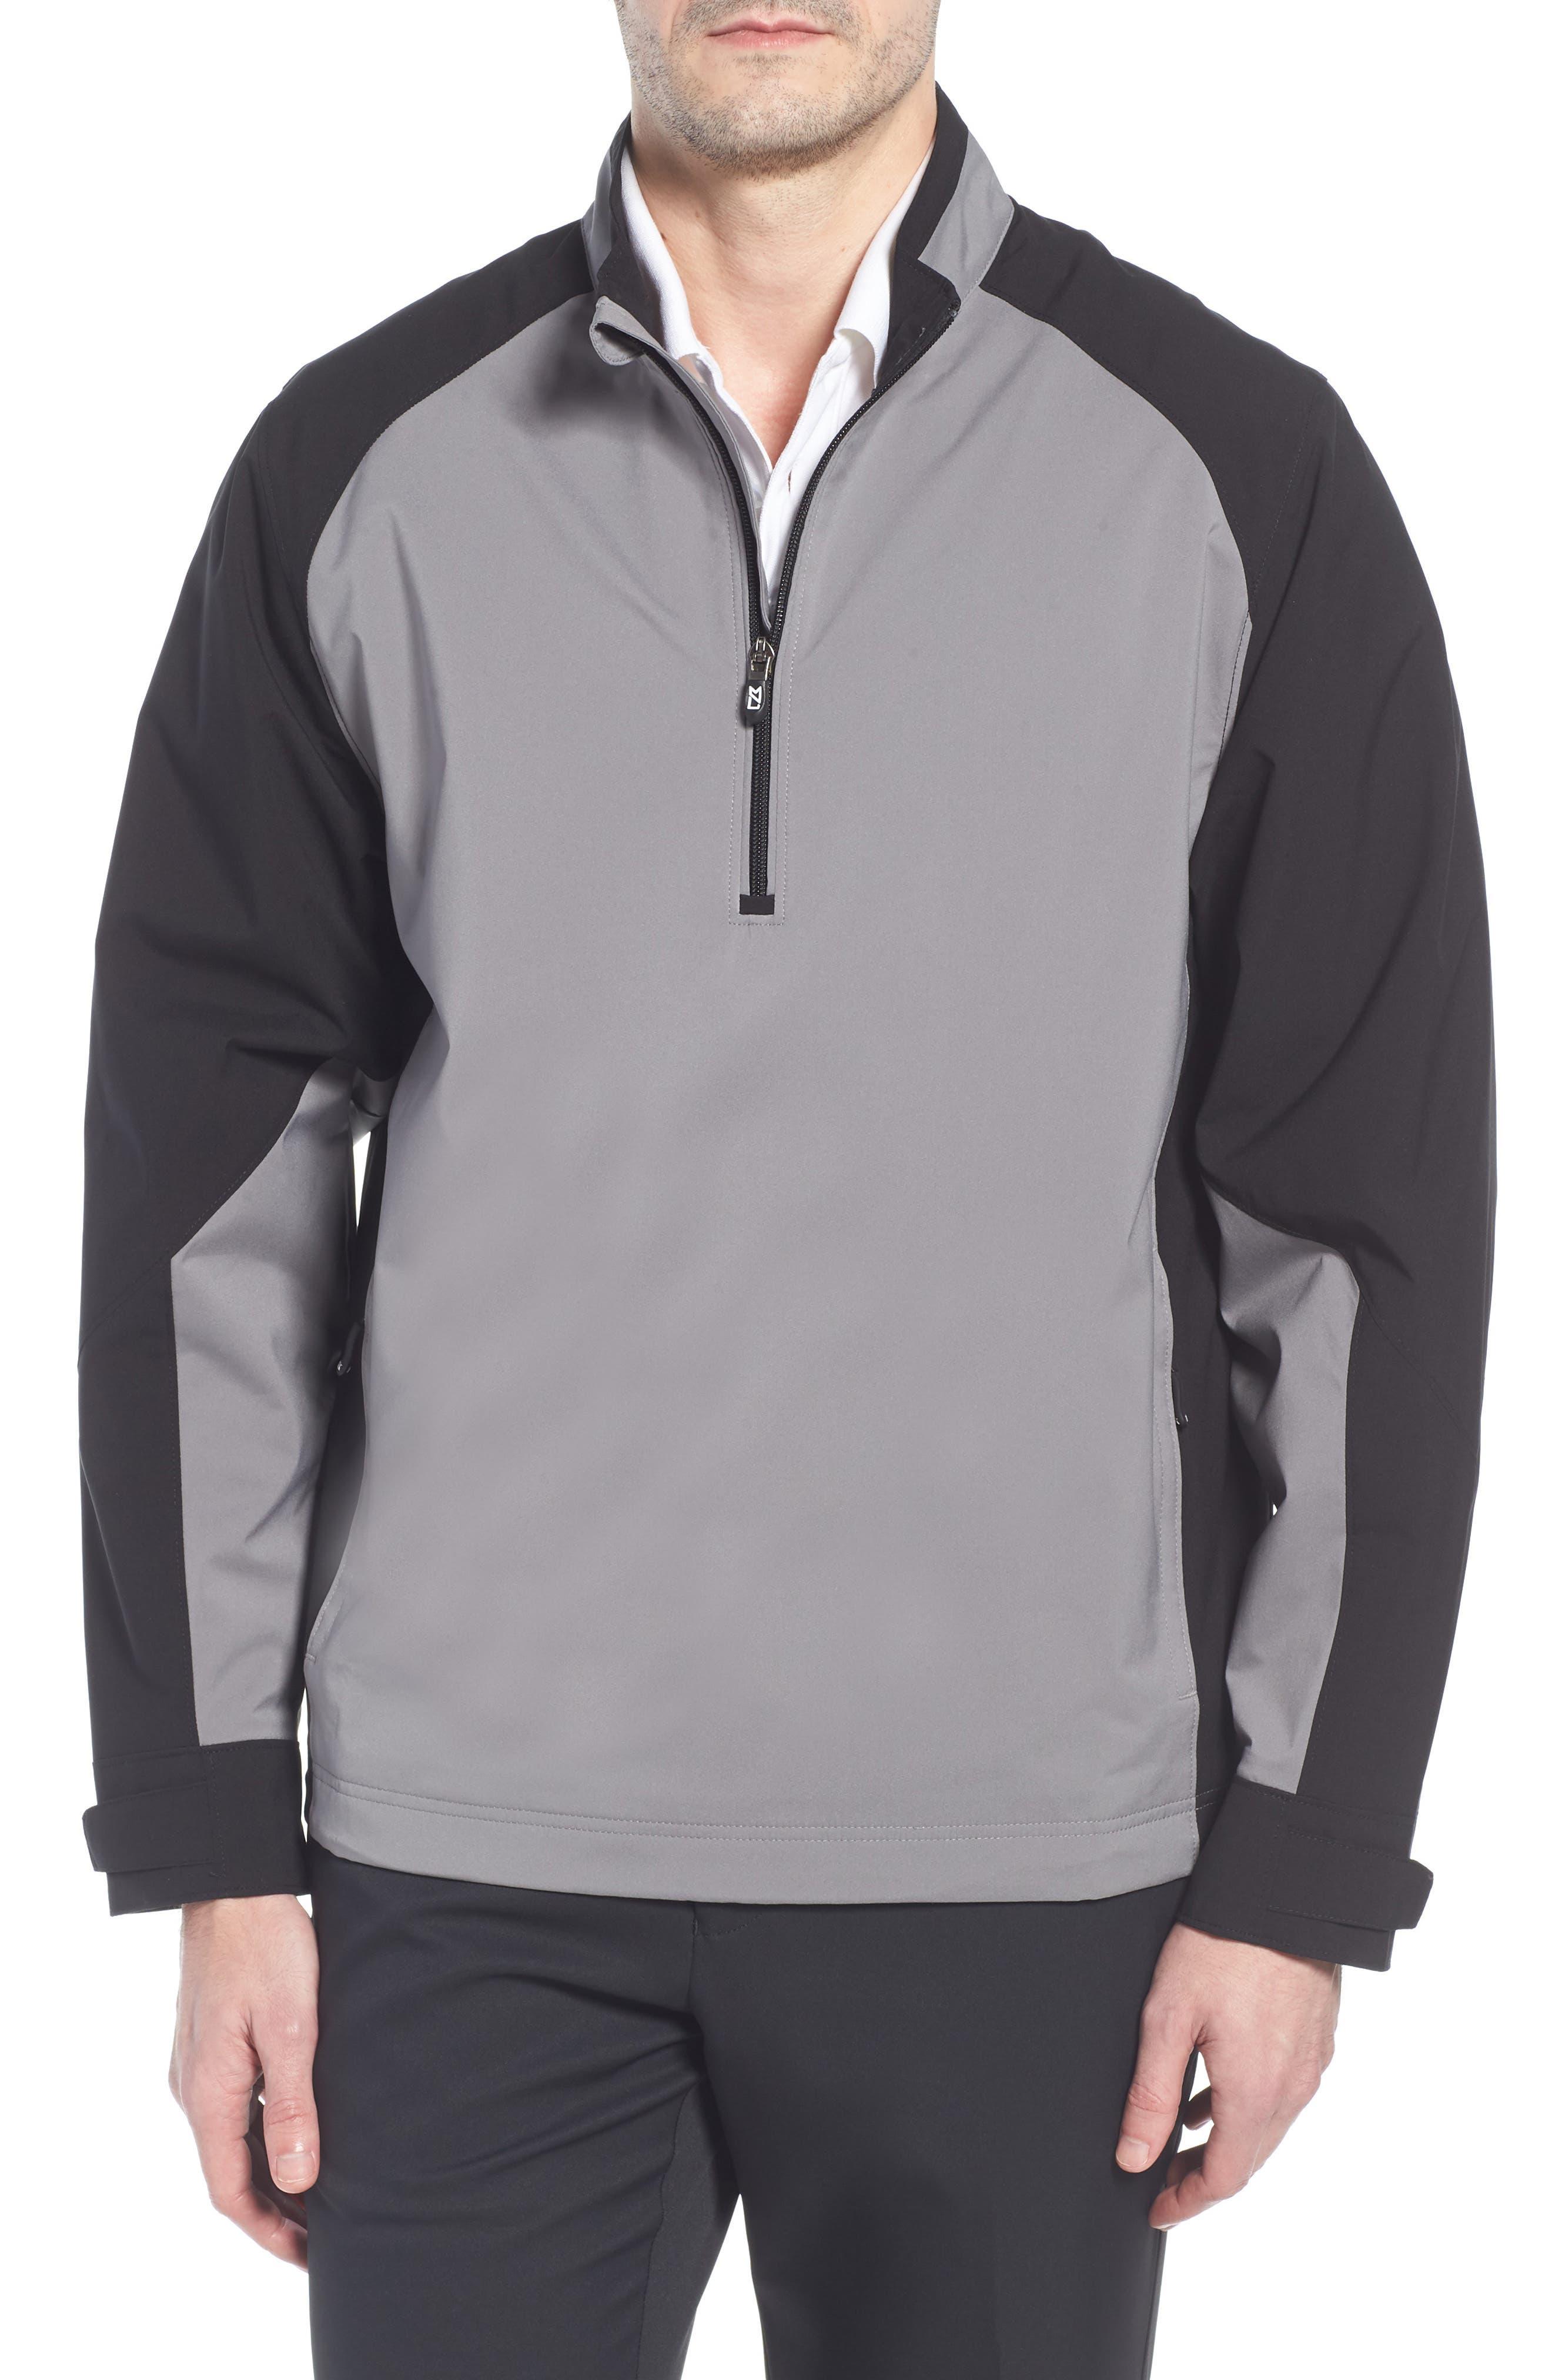 'Summit' WeatherTec Wind & Water Resistant Half Zip Jacket,                             Main thumbnail 1, color,                             Gravel